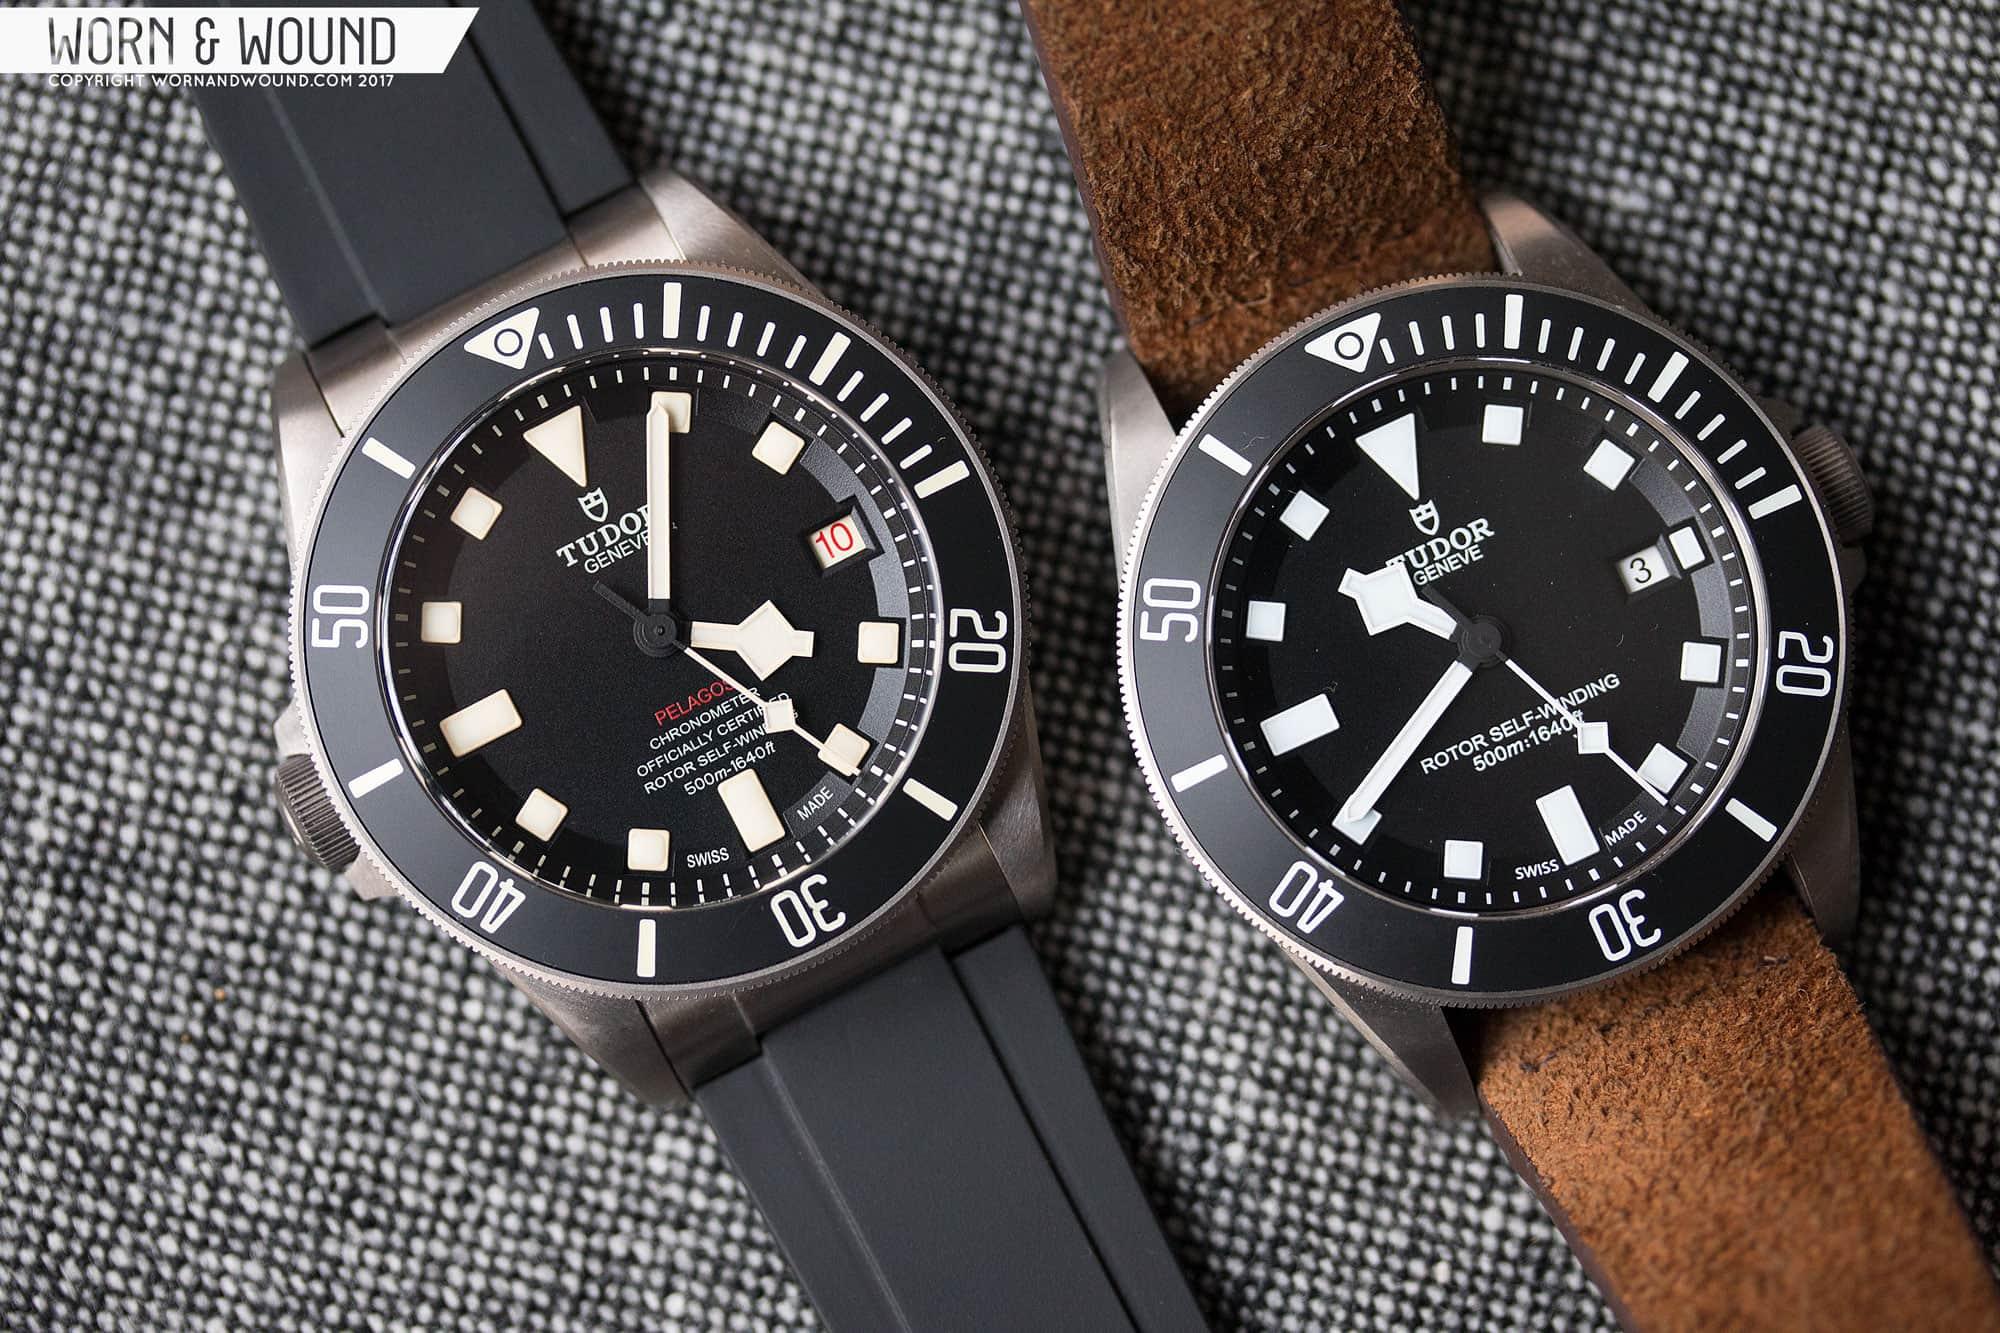 8f854a46820 Tudor Pelagos LHD Review - Worn   Wound